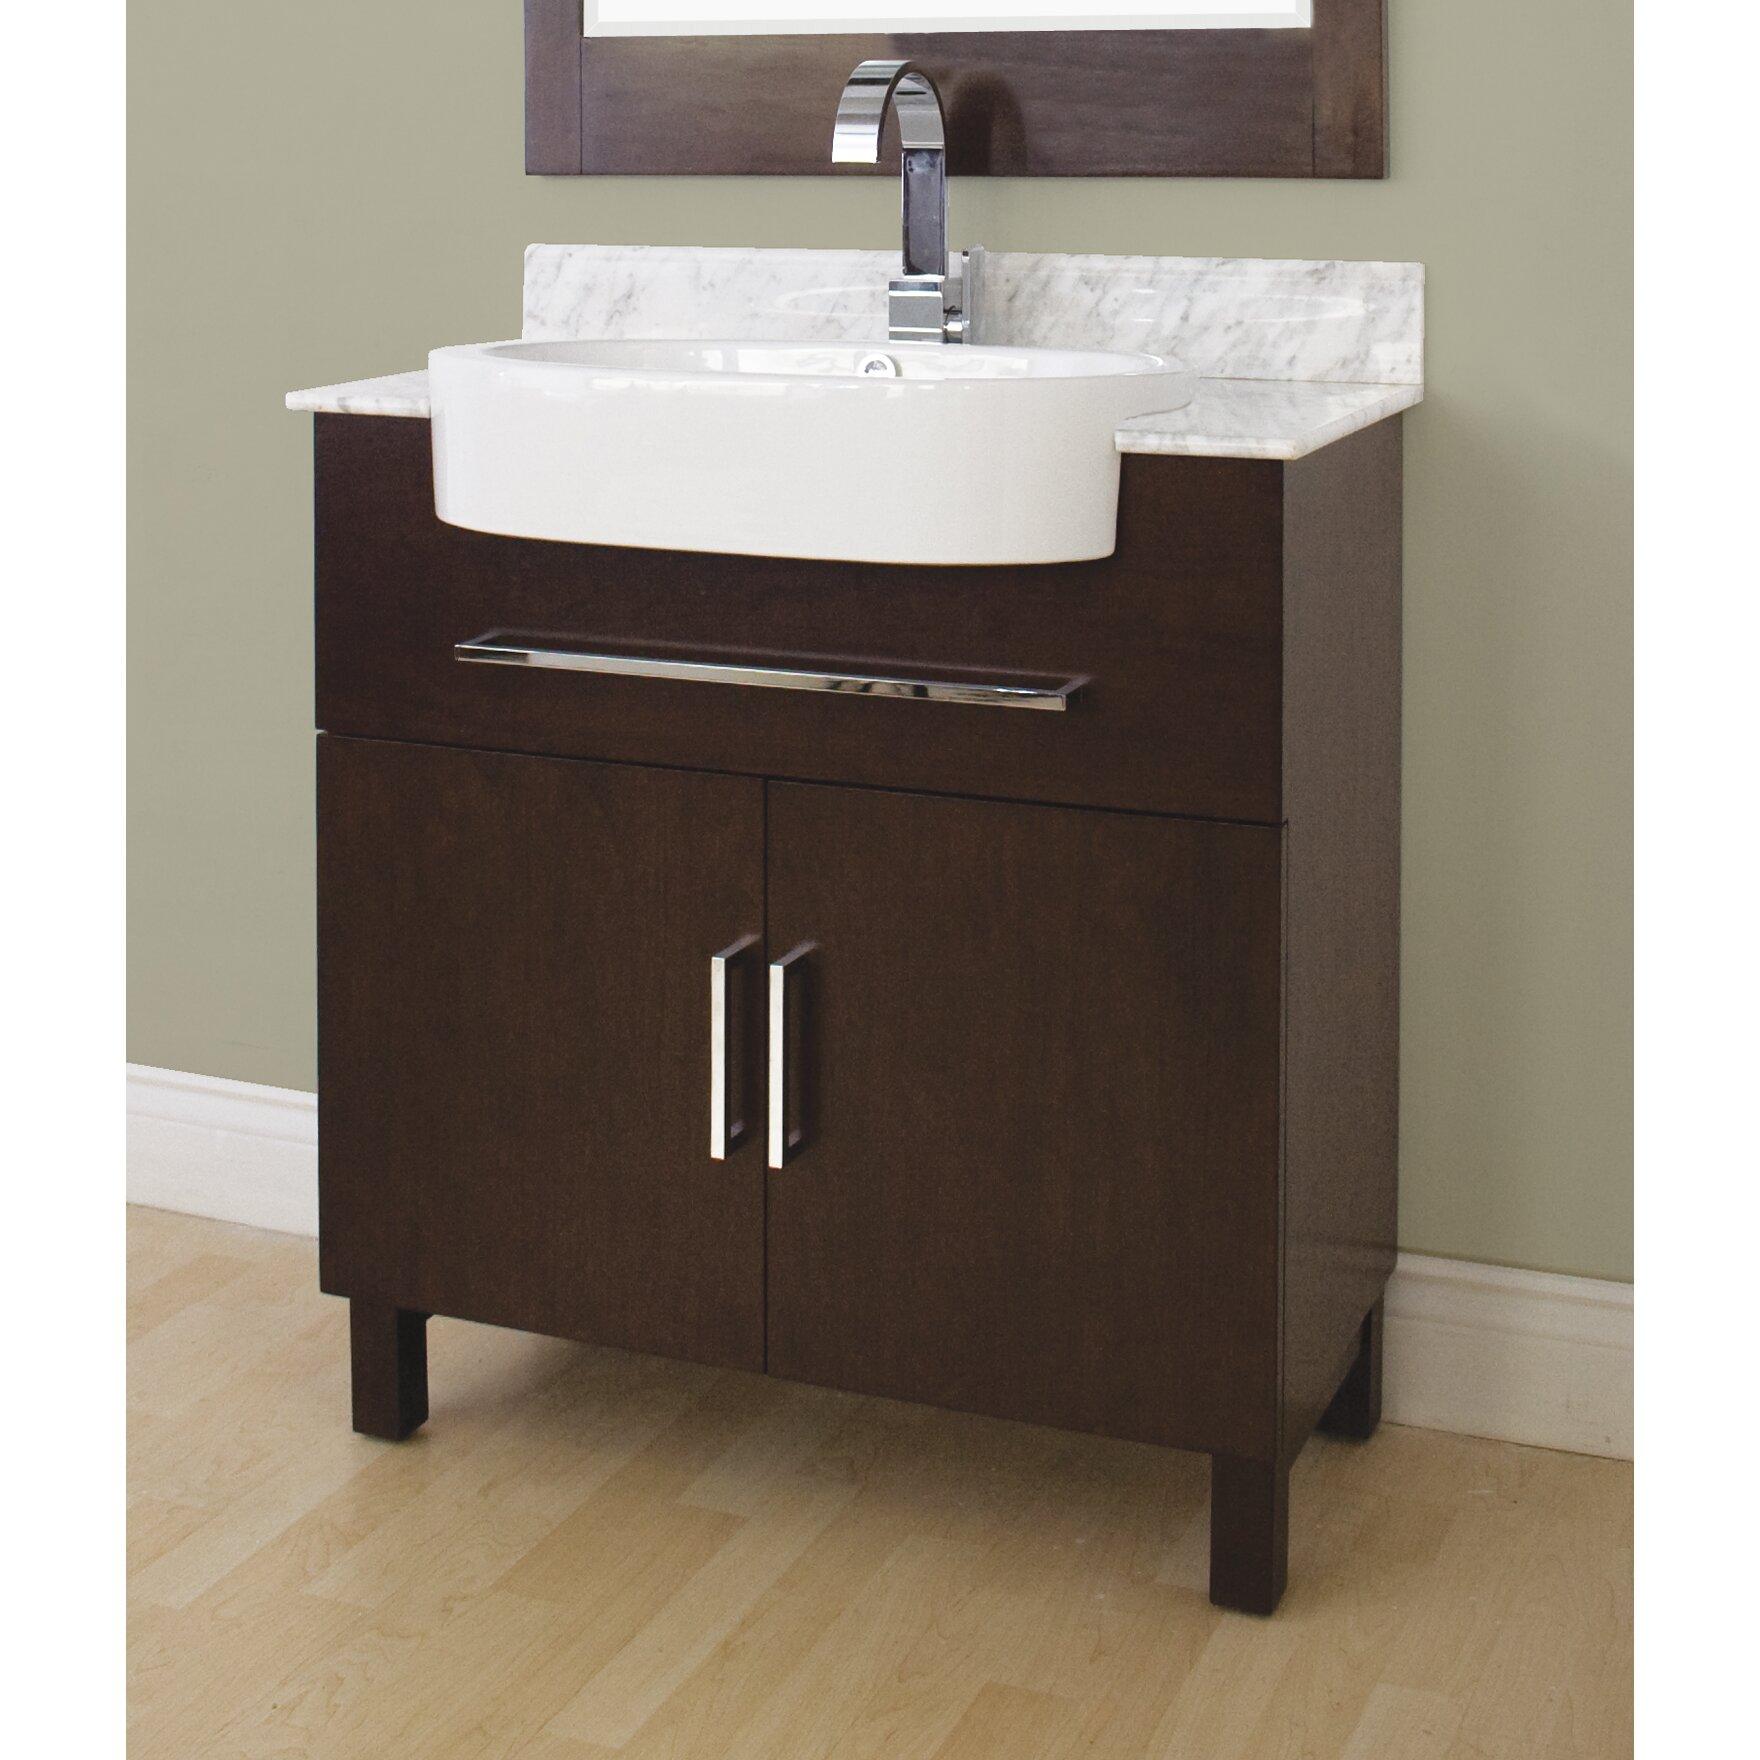 American Imaginations 33 Single Transitional Bathroom Vanity Set Reviews Wayfair